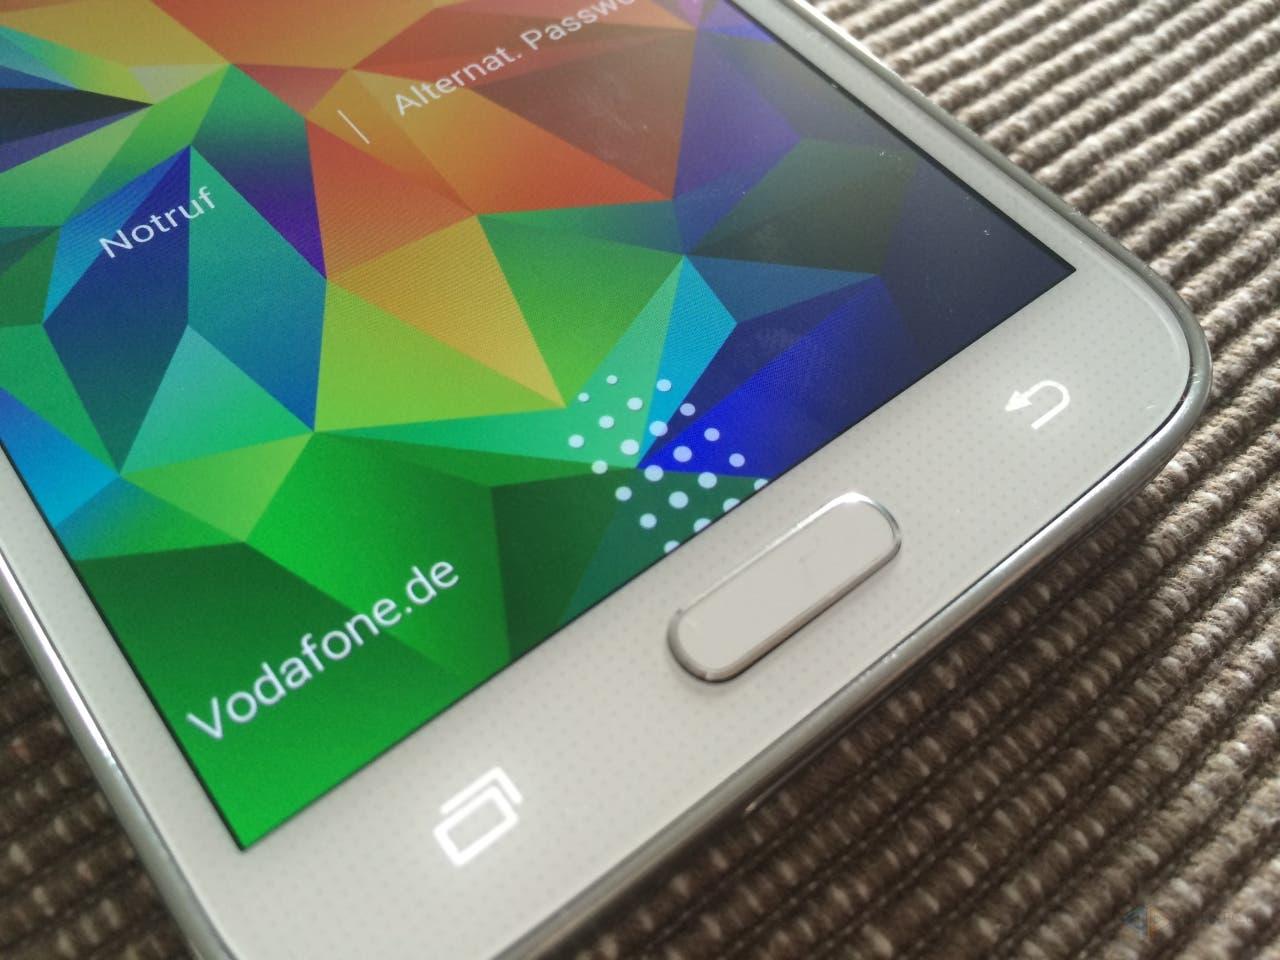 Samsung Galaxy S5 Fingerprintsensor